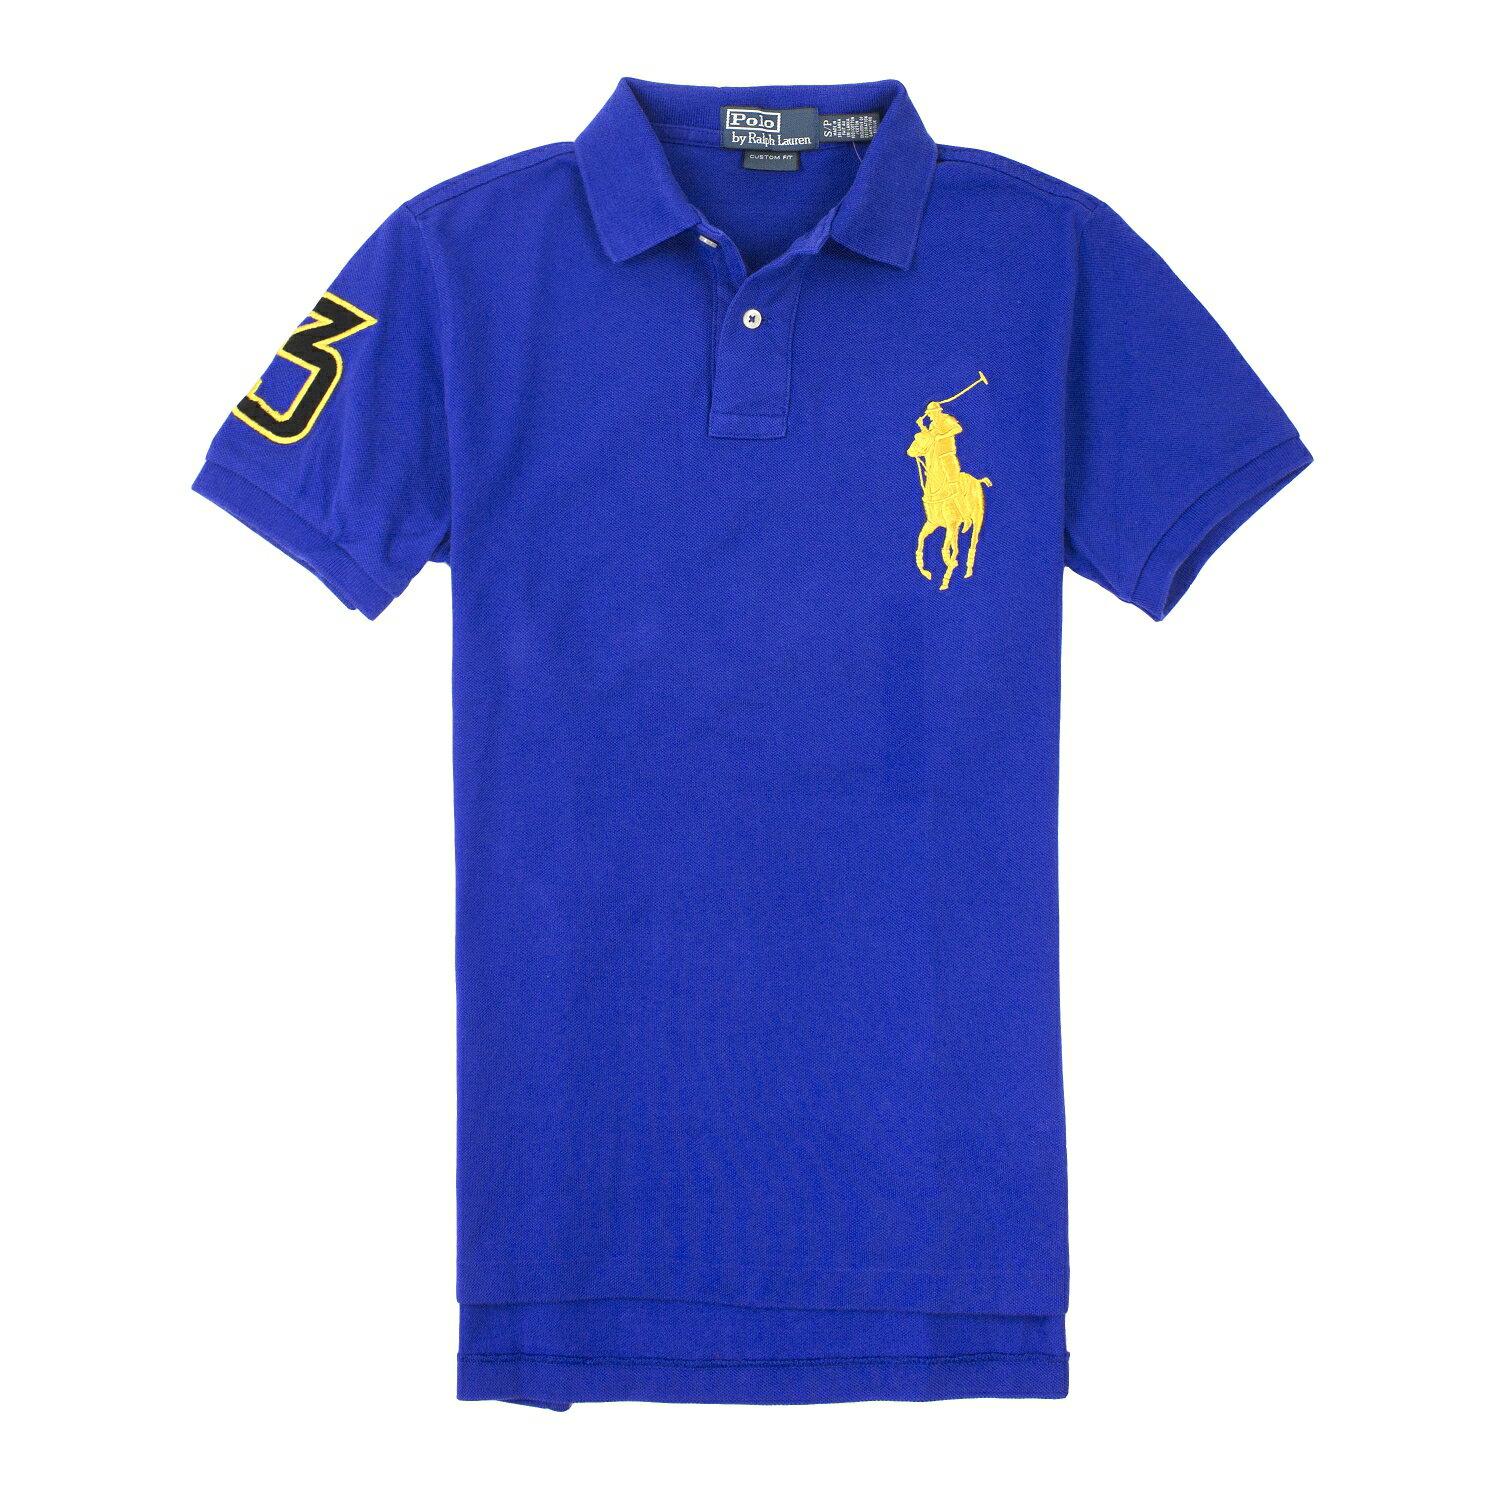 <br/><br/>  美國百分百【全新真品】Ralph Lauren Polo衫 RL 短袖 上衣 Polo 大馬 寶藍 金馬 素面 男 XS L號<br/><br/>